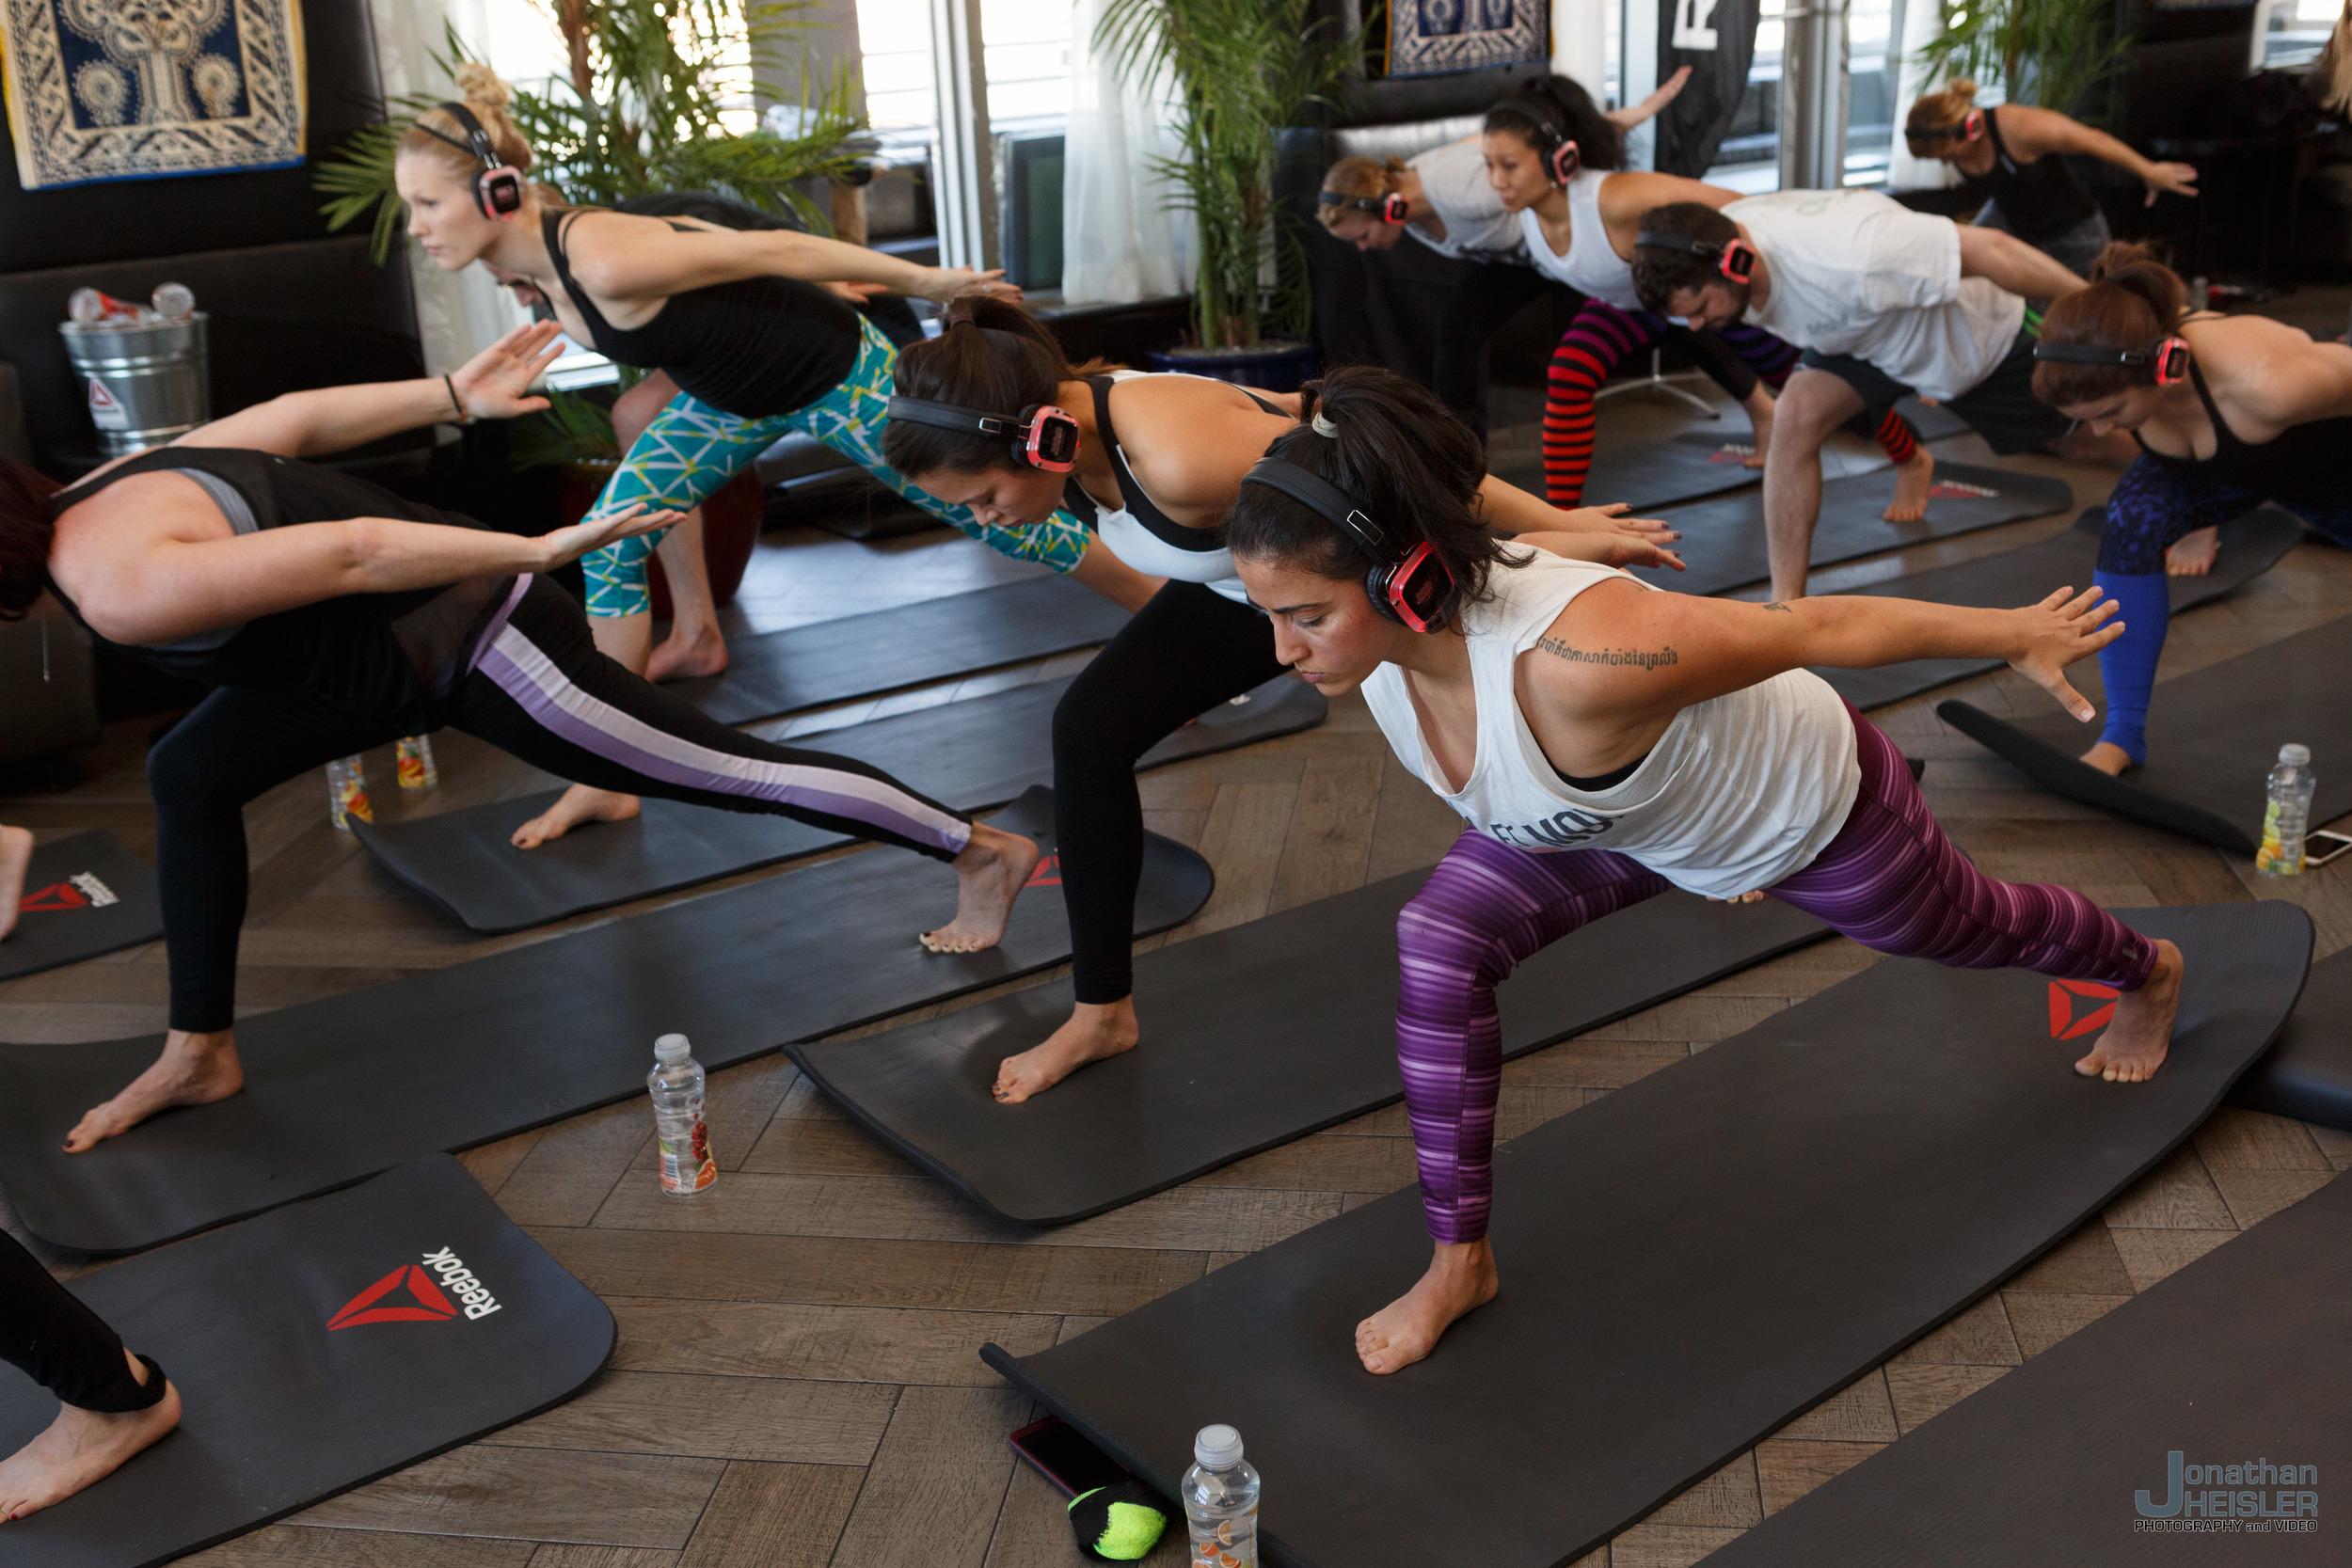 Reebok NYC Yoga_ Gansevoort Hotel NYC __  Jonathan Heisler _ 11.21.2015_010f_5.0.jpg